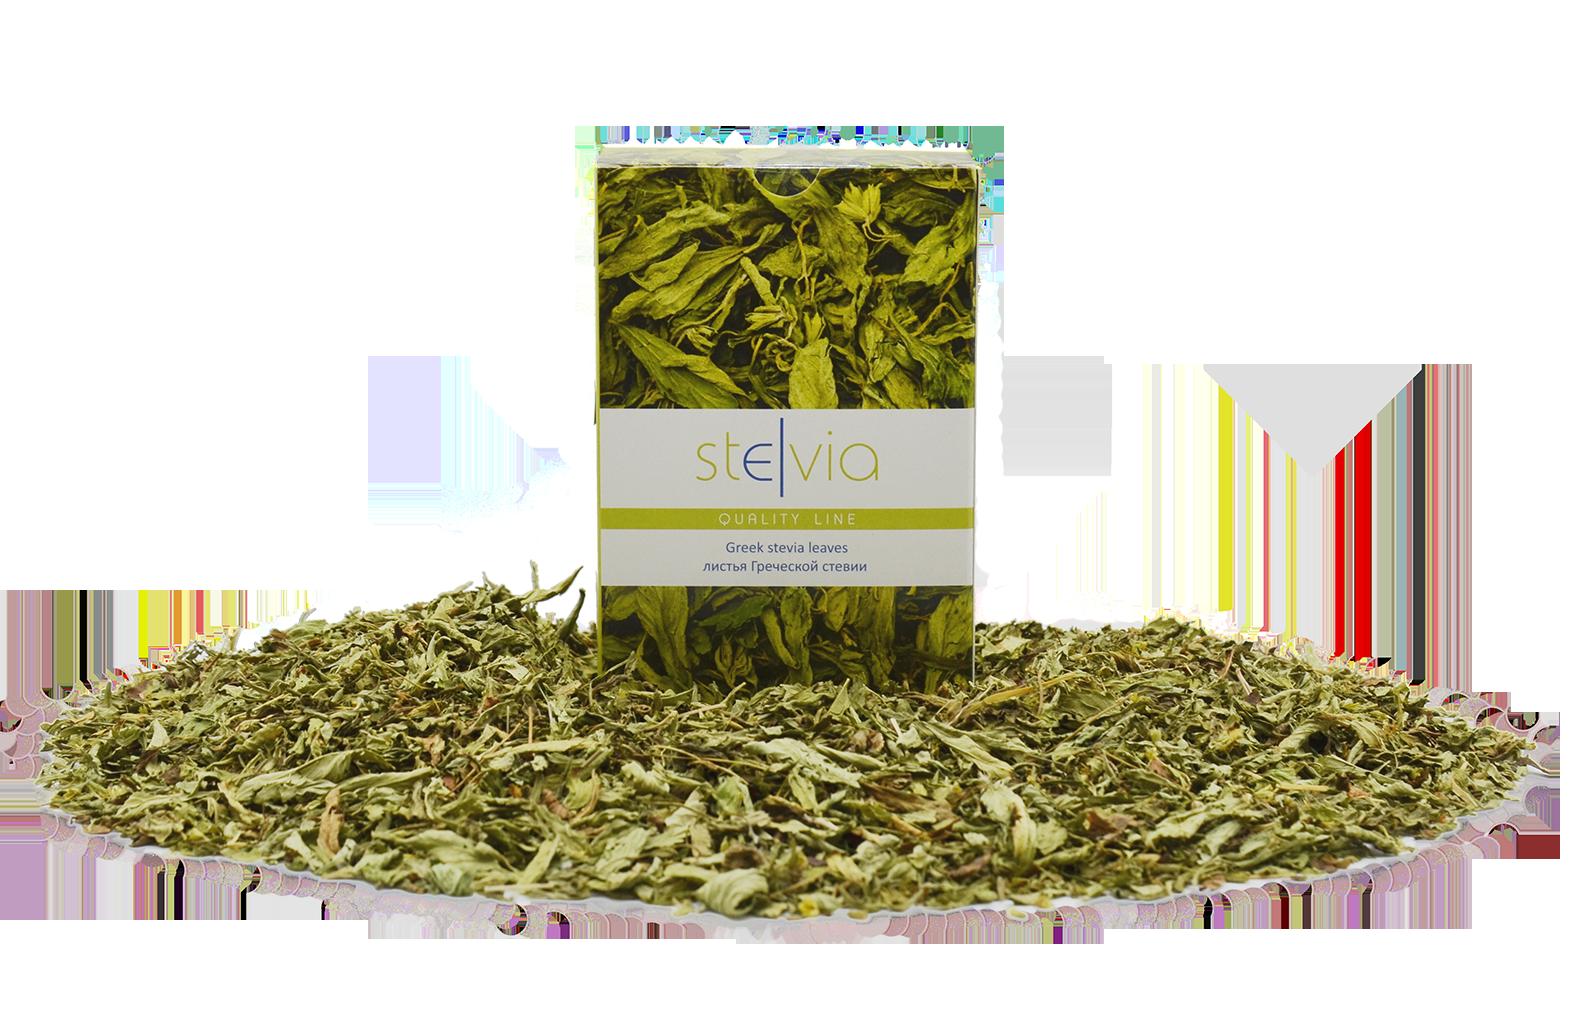 Ellhnika fylla stevias